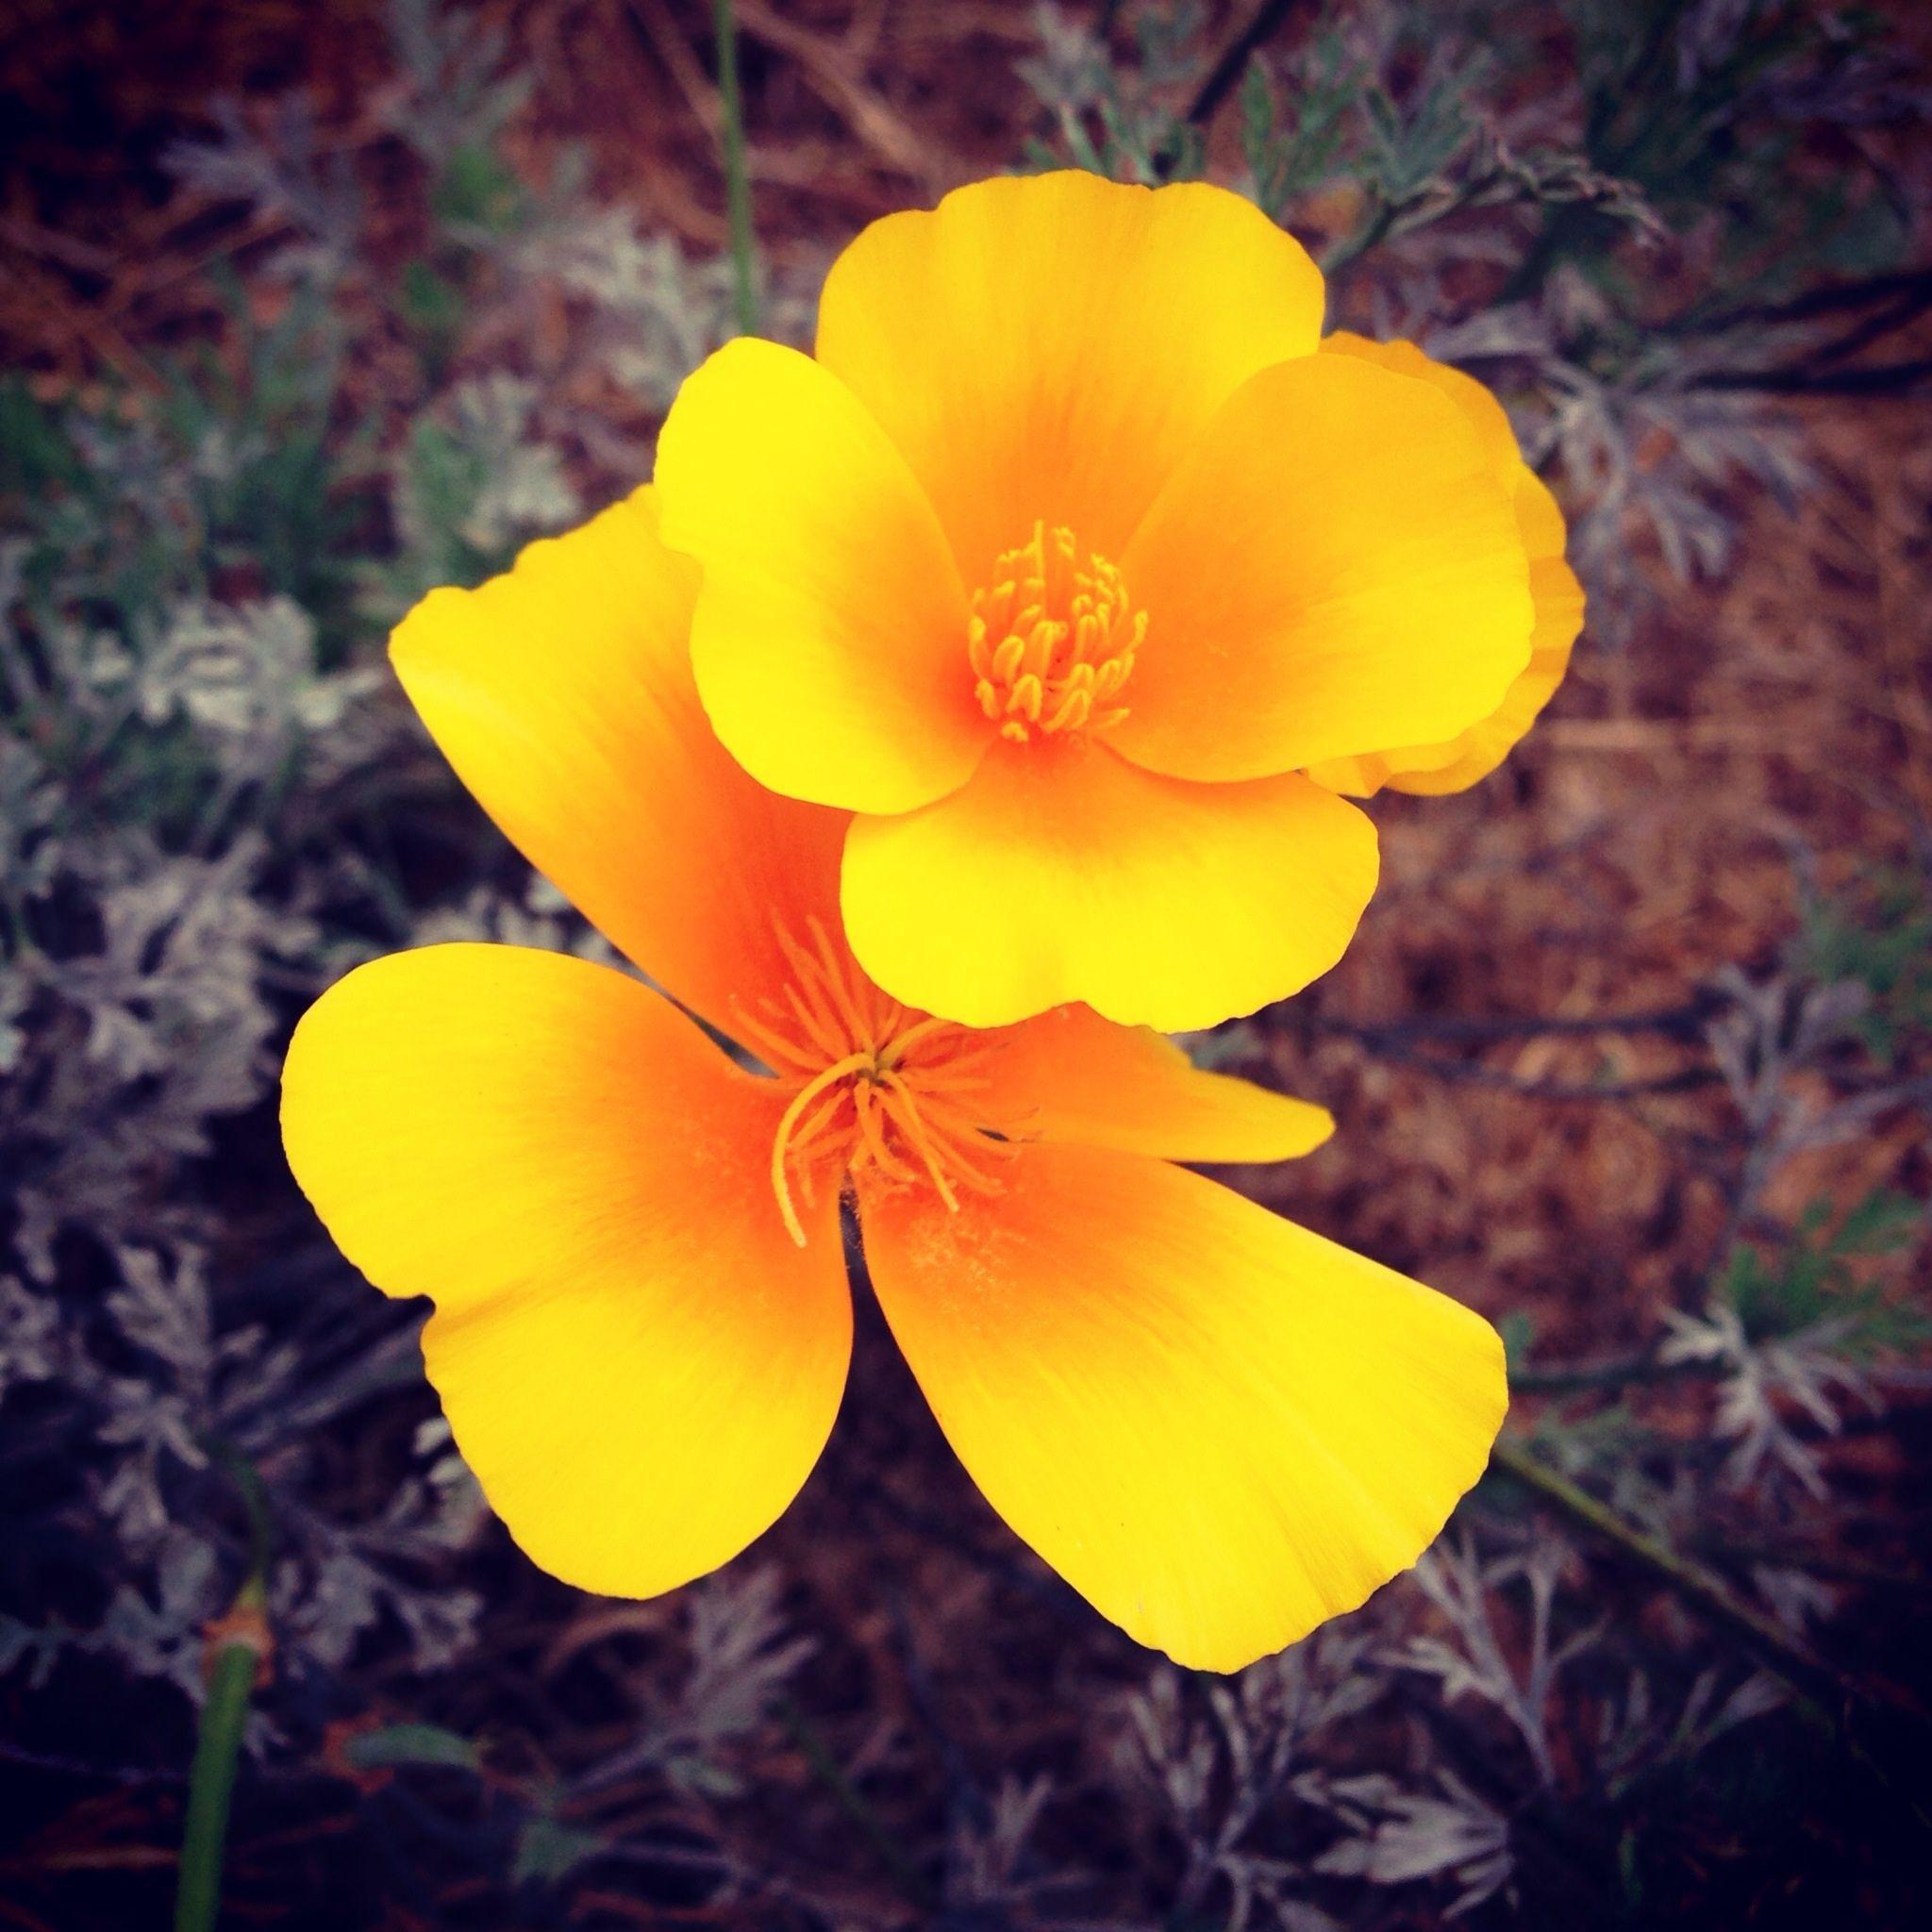 The Golden Poppy California State Flower Tatoo ideas Pinterest